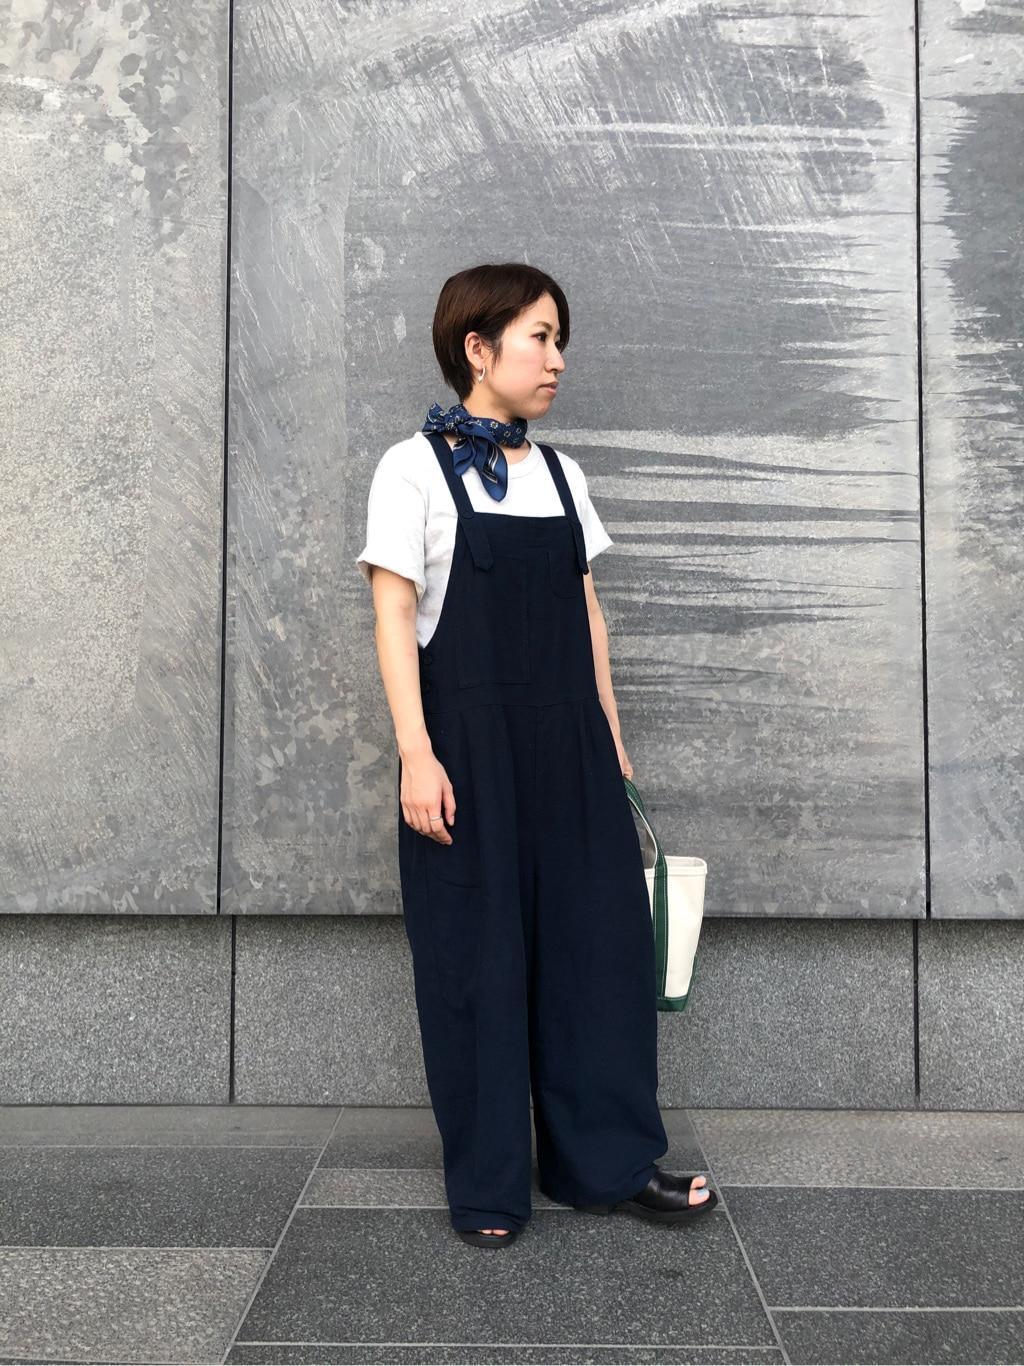 bulle de savon なんばシティ 身長:148cm 2020.08.14